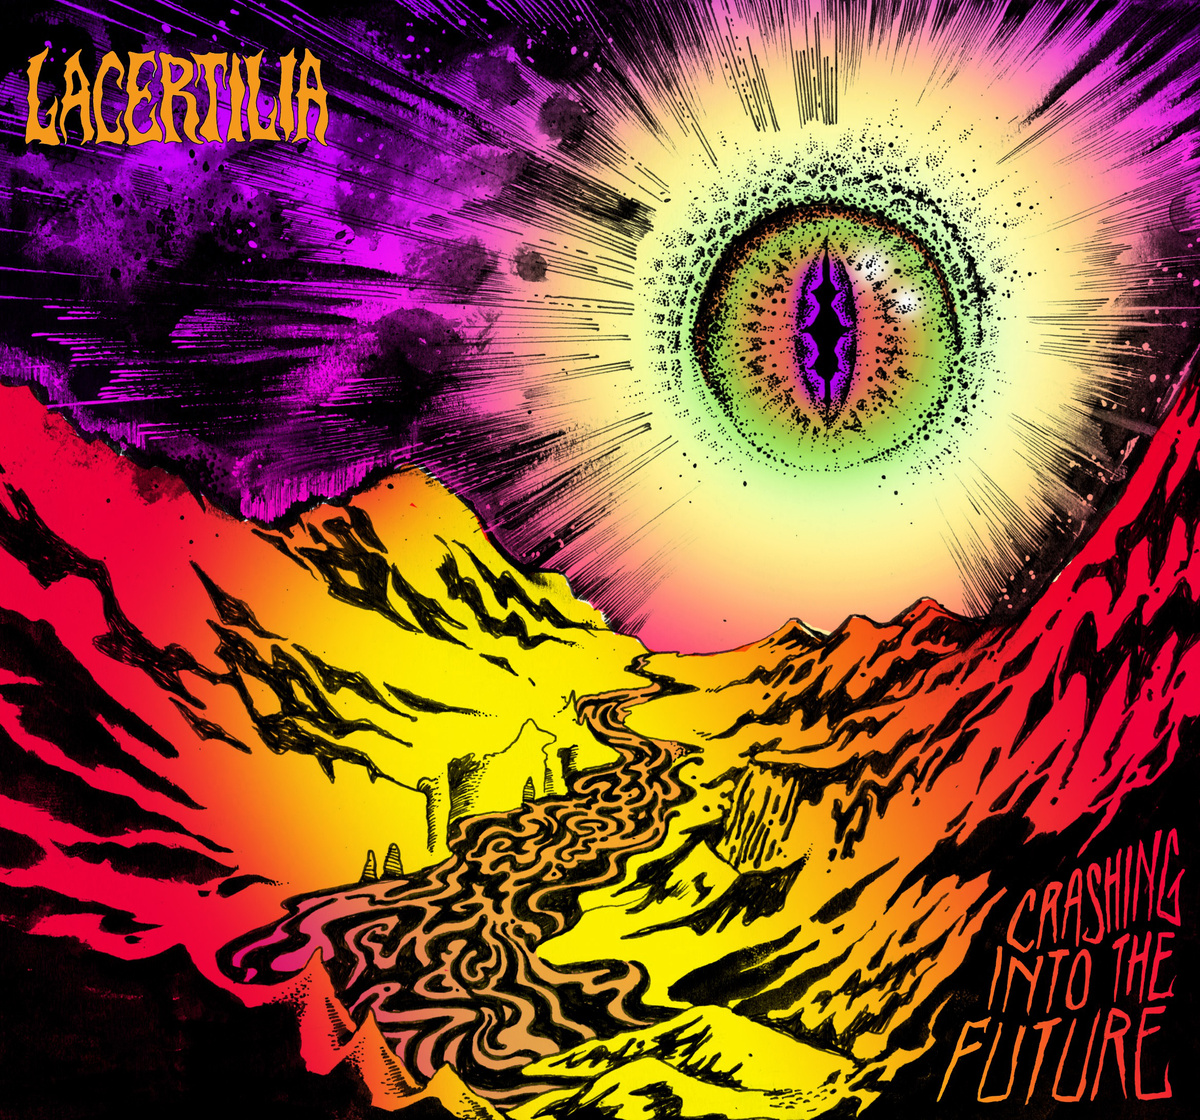 Lacertilia - Crashing Into The Future